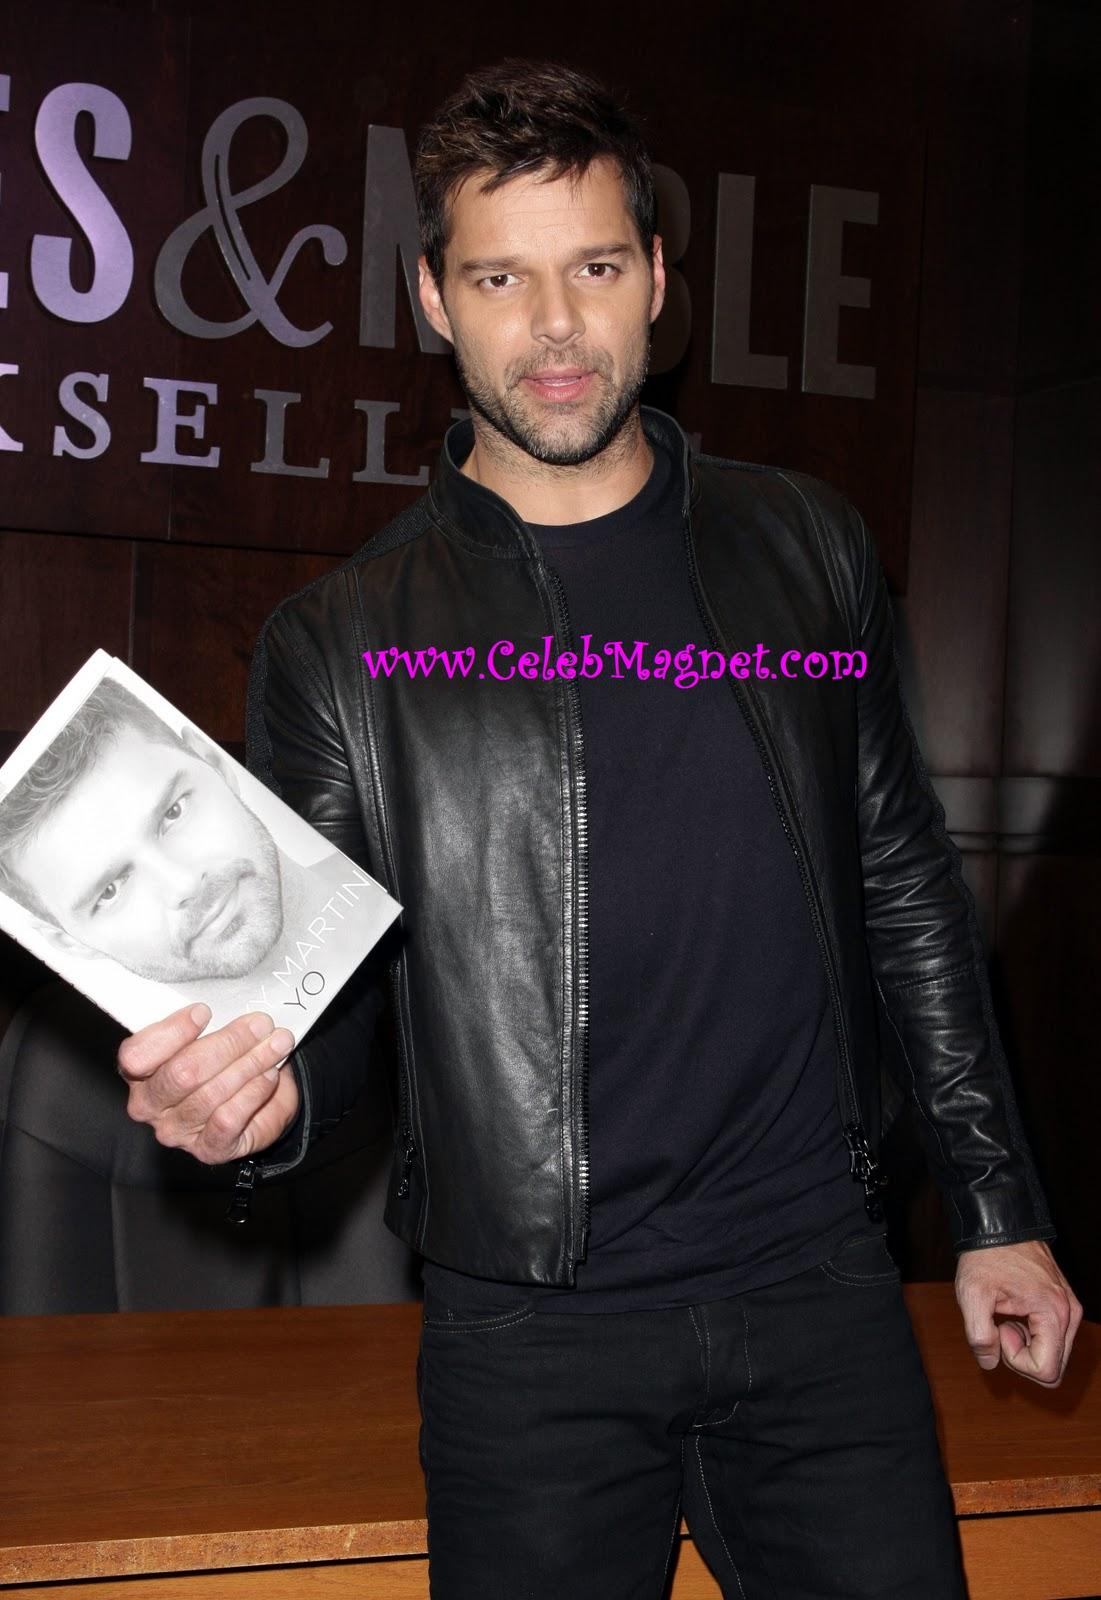 http://4.bp.blogspot.com/_LQQ5FS2UDbY/TNr95DYrIEI/AAAAAAAACzY/1Ei8gAEFxUw/s1600/Ricky+Martin+Me+Book+Signing+4.jpg